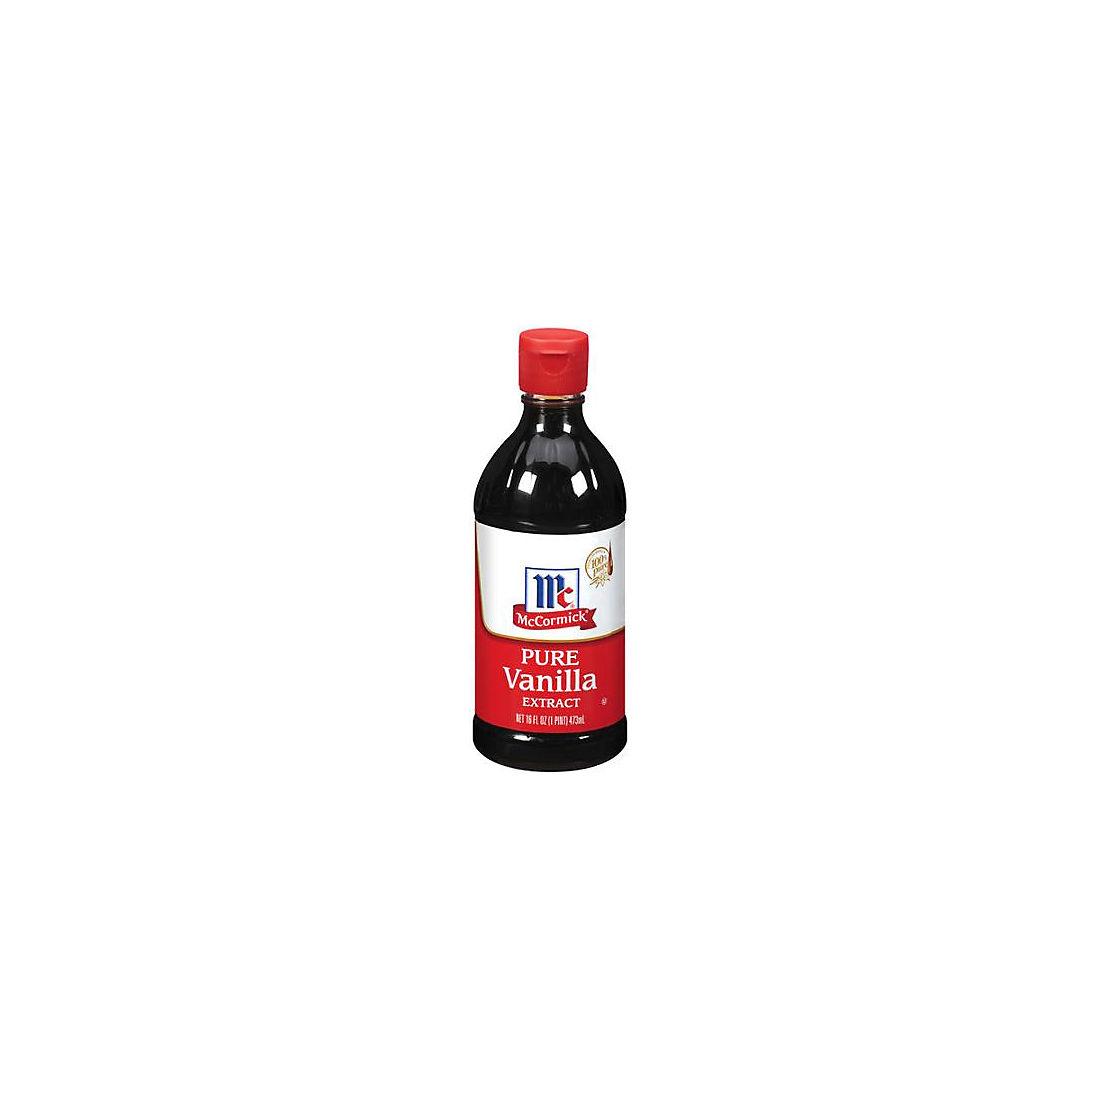 McCormick Pure Vanilla Extract, 16 oz